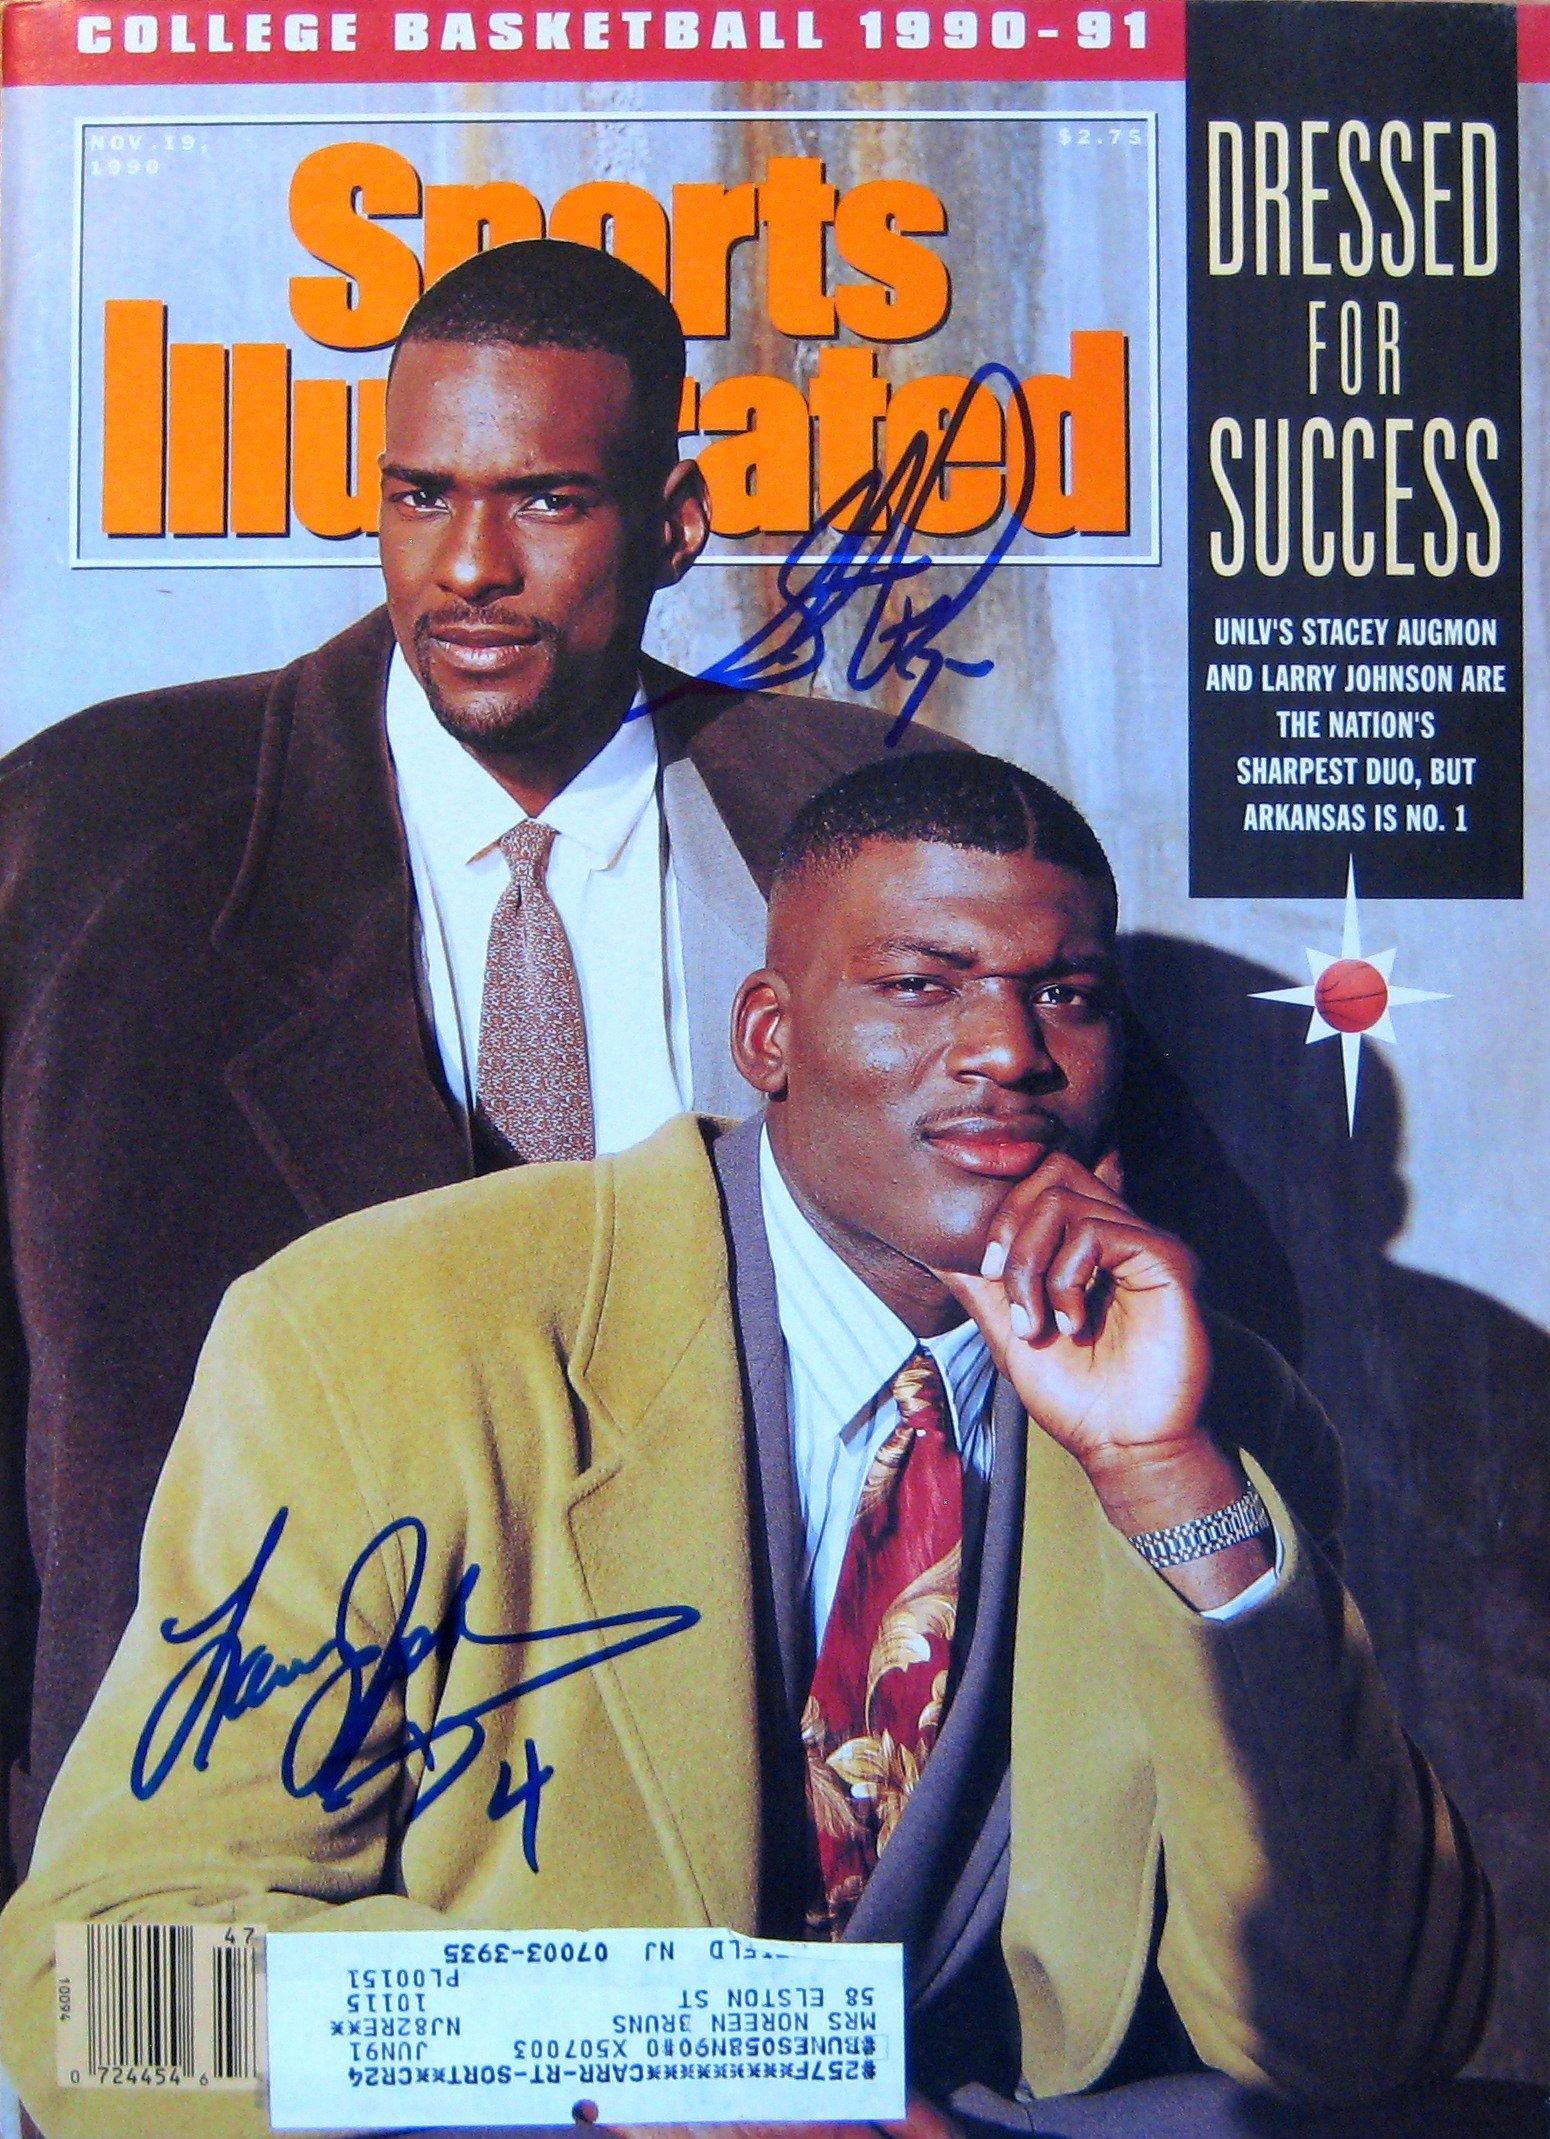 Johnson, Larry & Augmon, Stacey 11/19/90 autographed magazine